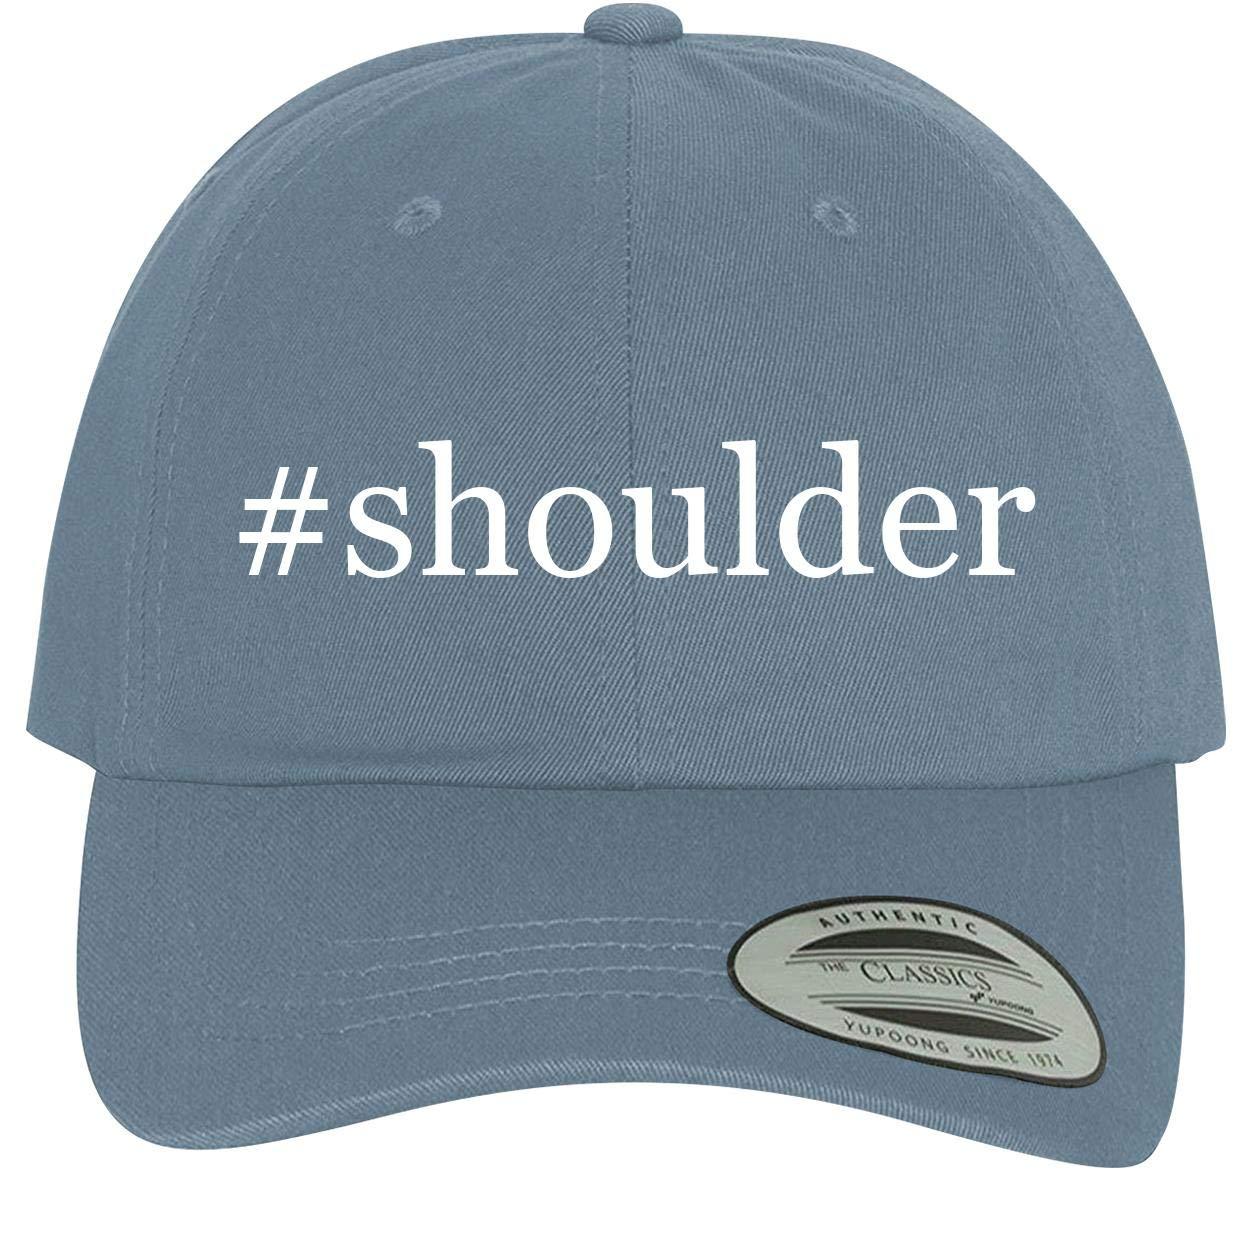 BH Cool Designs #Shoulder Comfortable Dad Hat Baseball Cap